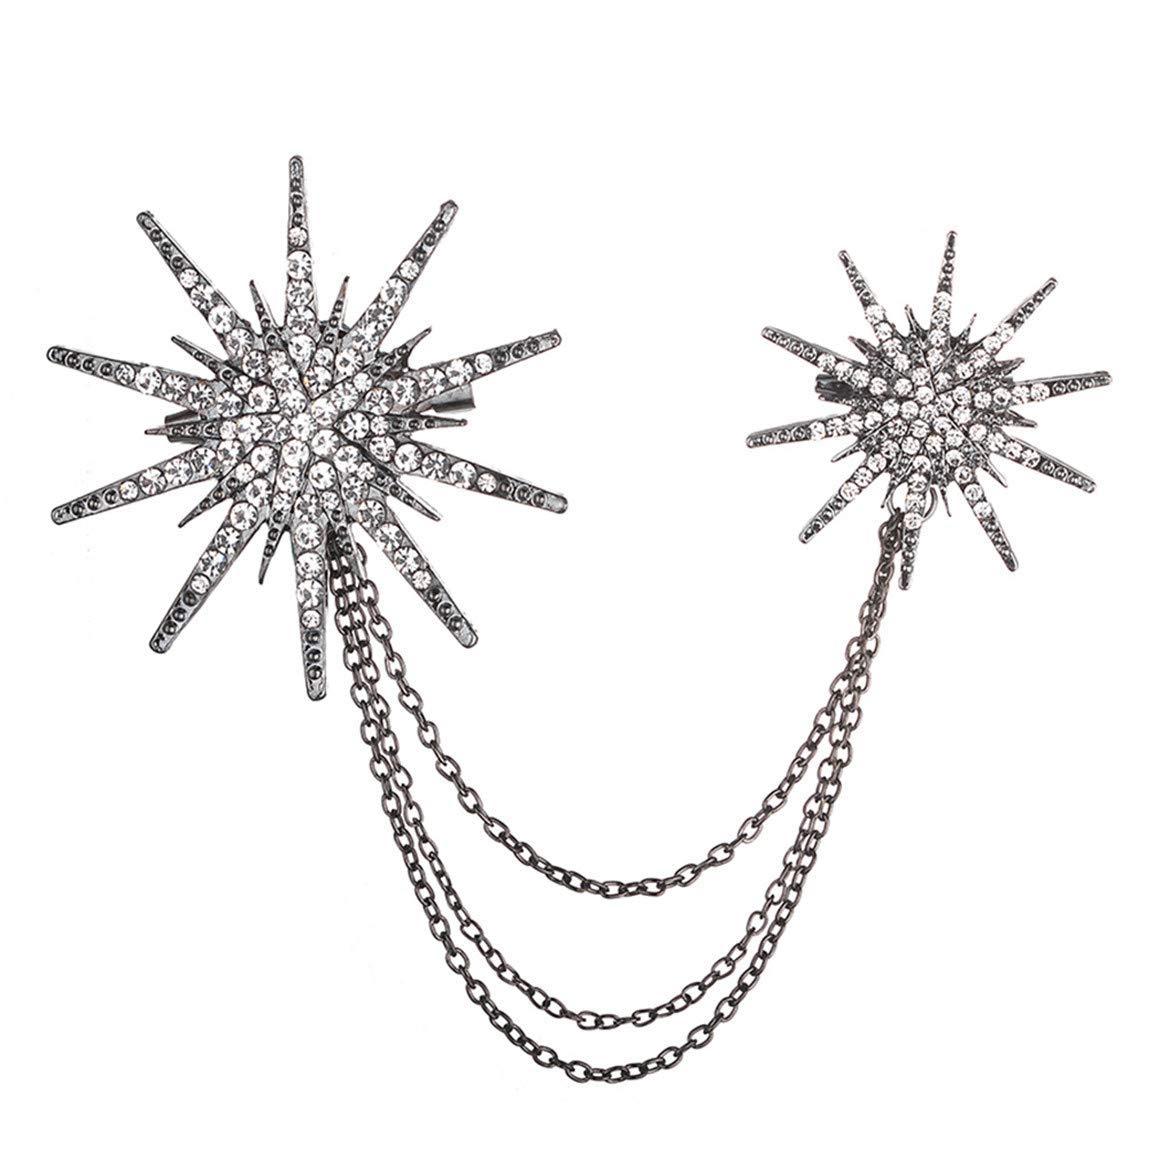 Ogquaton Elegante Broche de Cadena de Estrella de Diamantes de imitaci/ón Negro Patr/ón Ropa de Mujer Broche de decoraci/ón Creativo y /útil